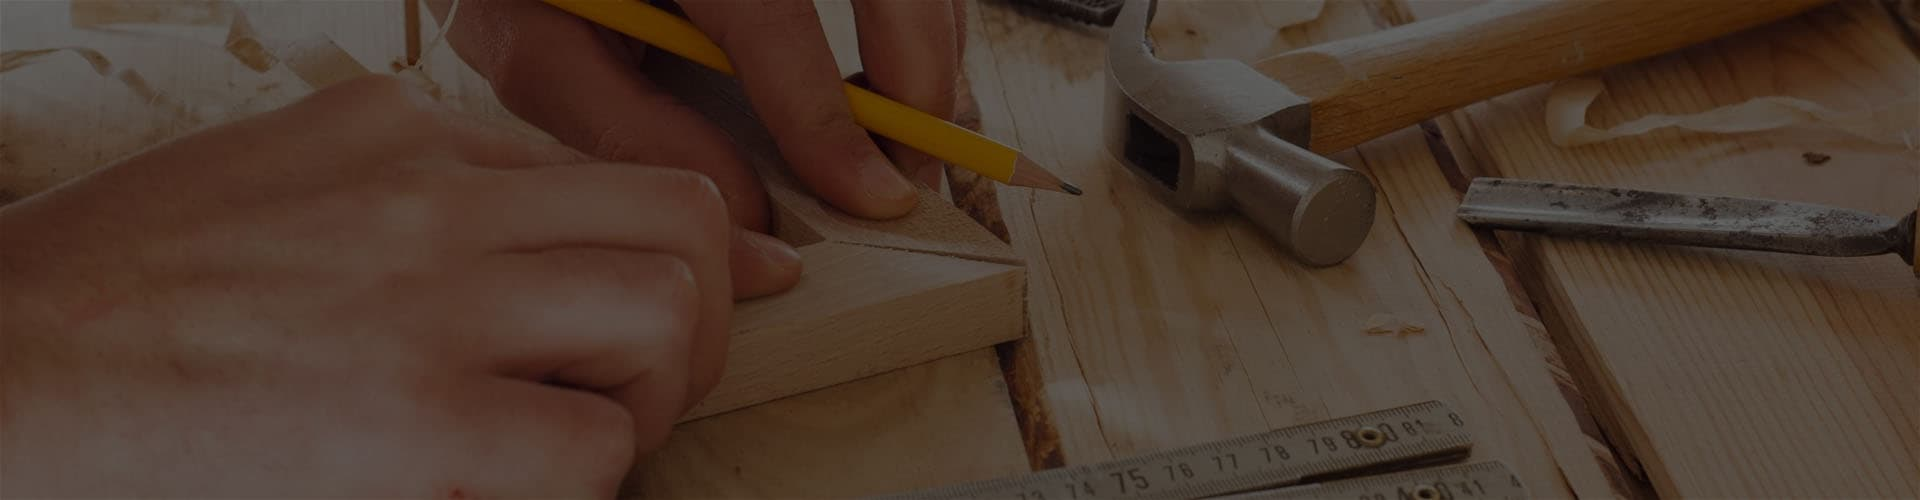 Плотник делает рамку